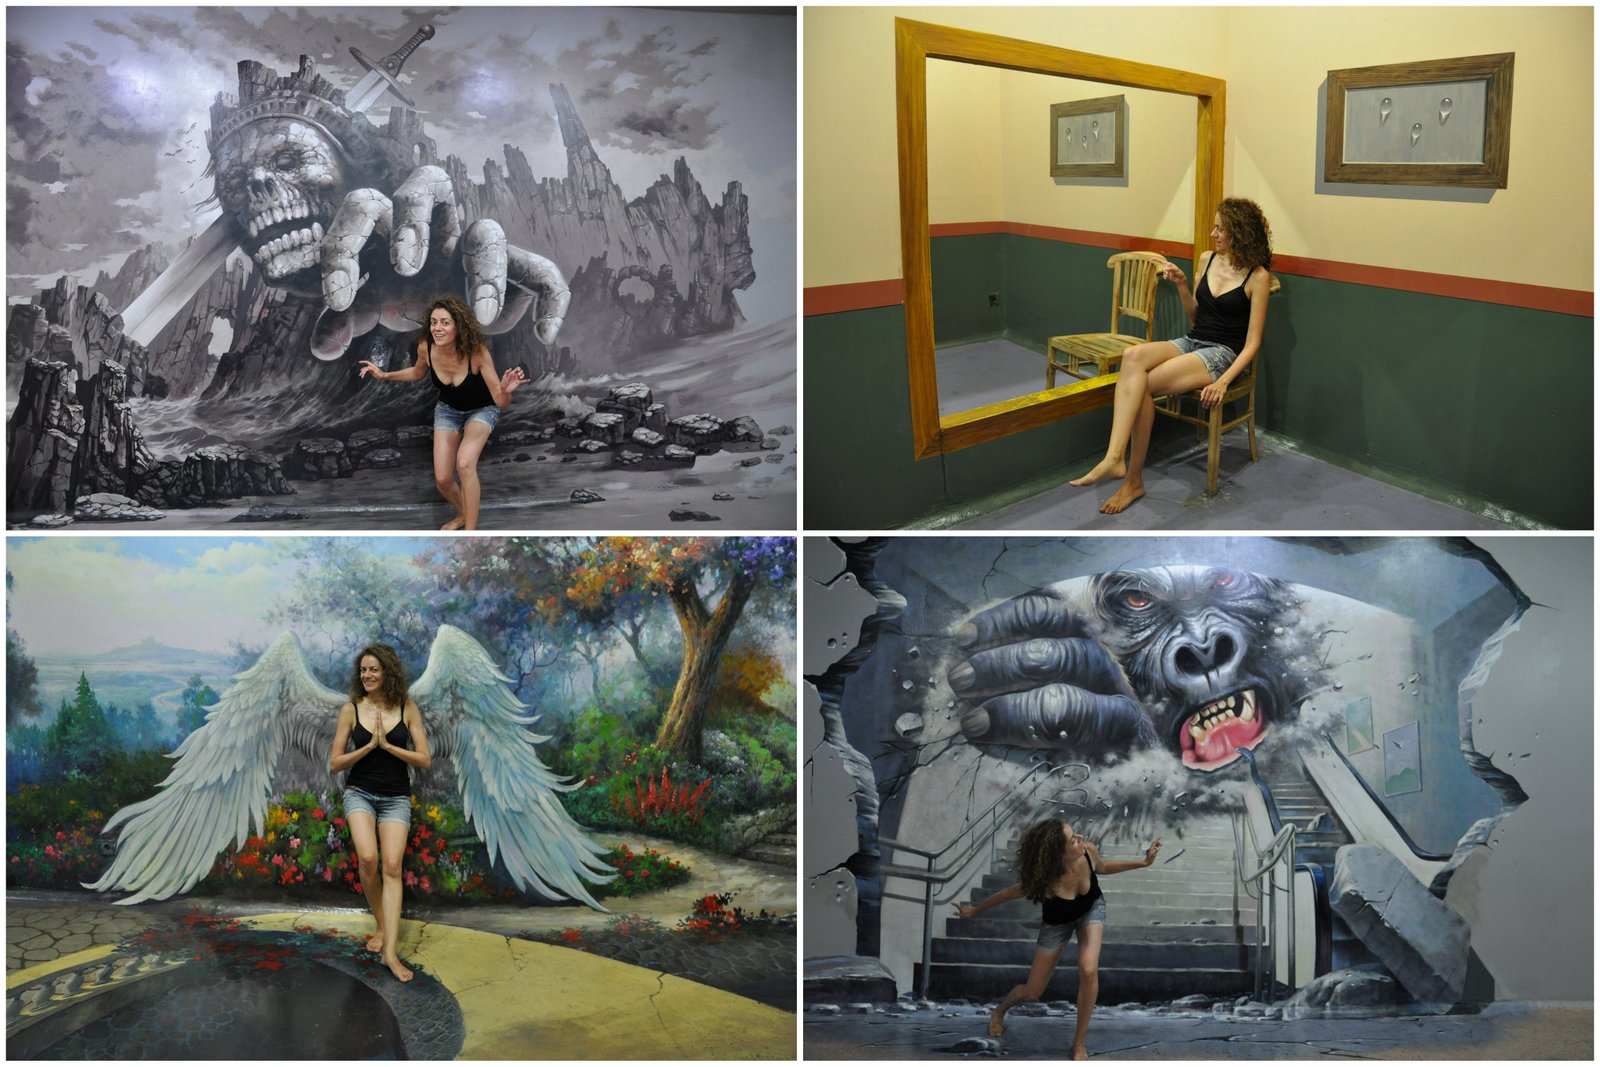 bali-musee-art-illusion